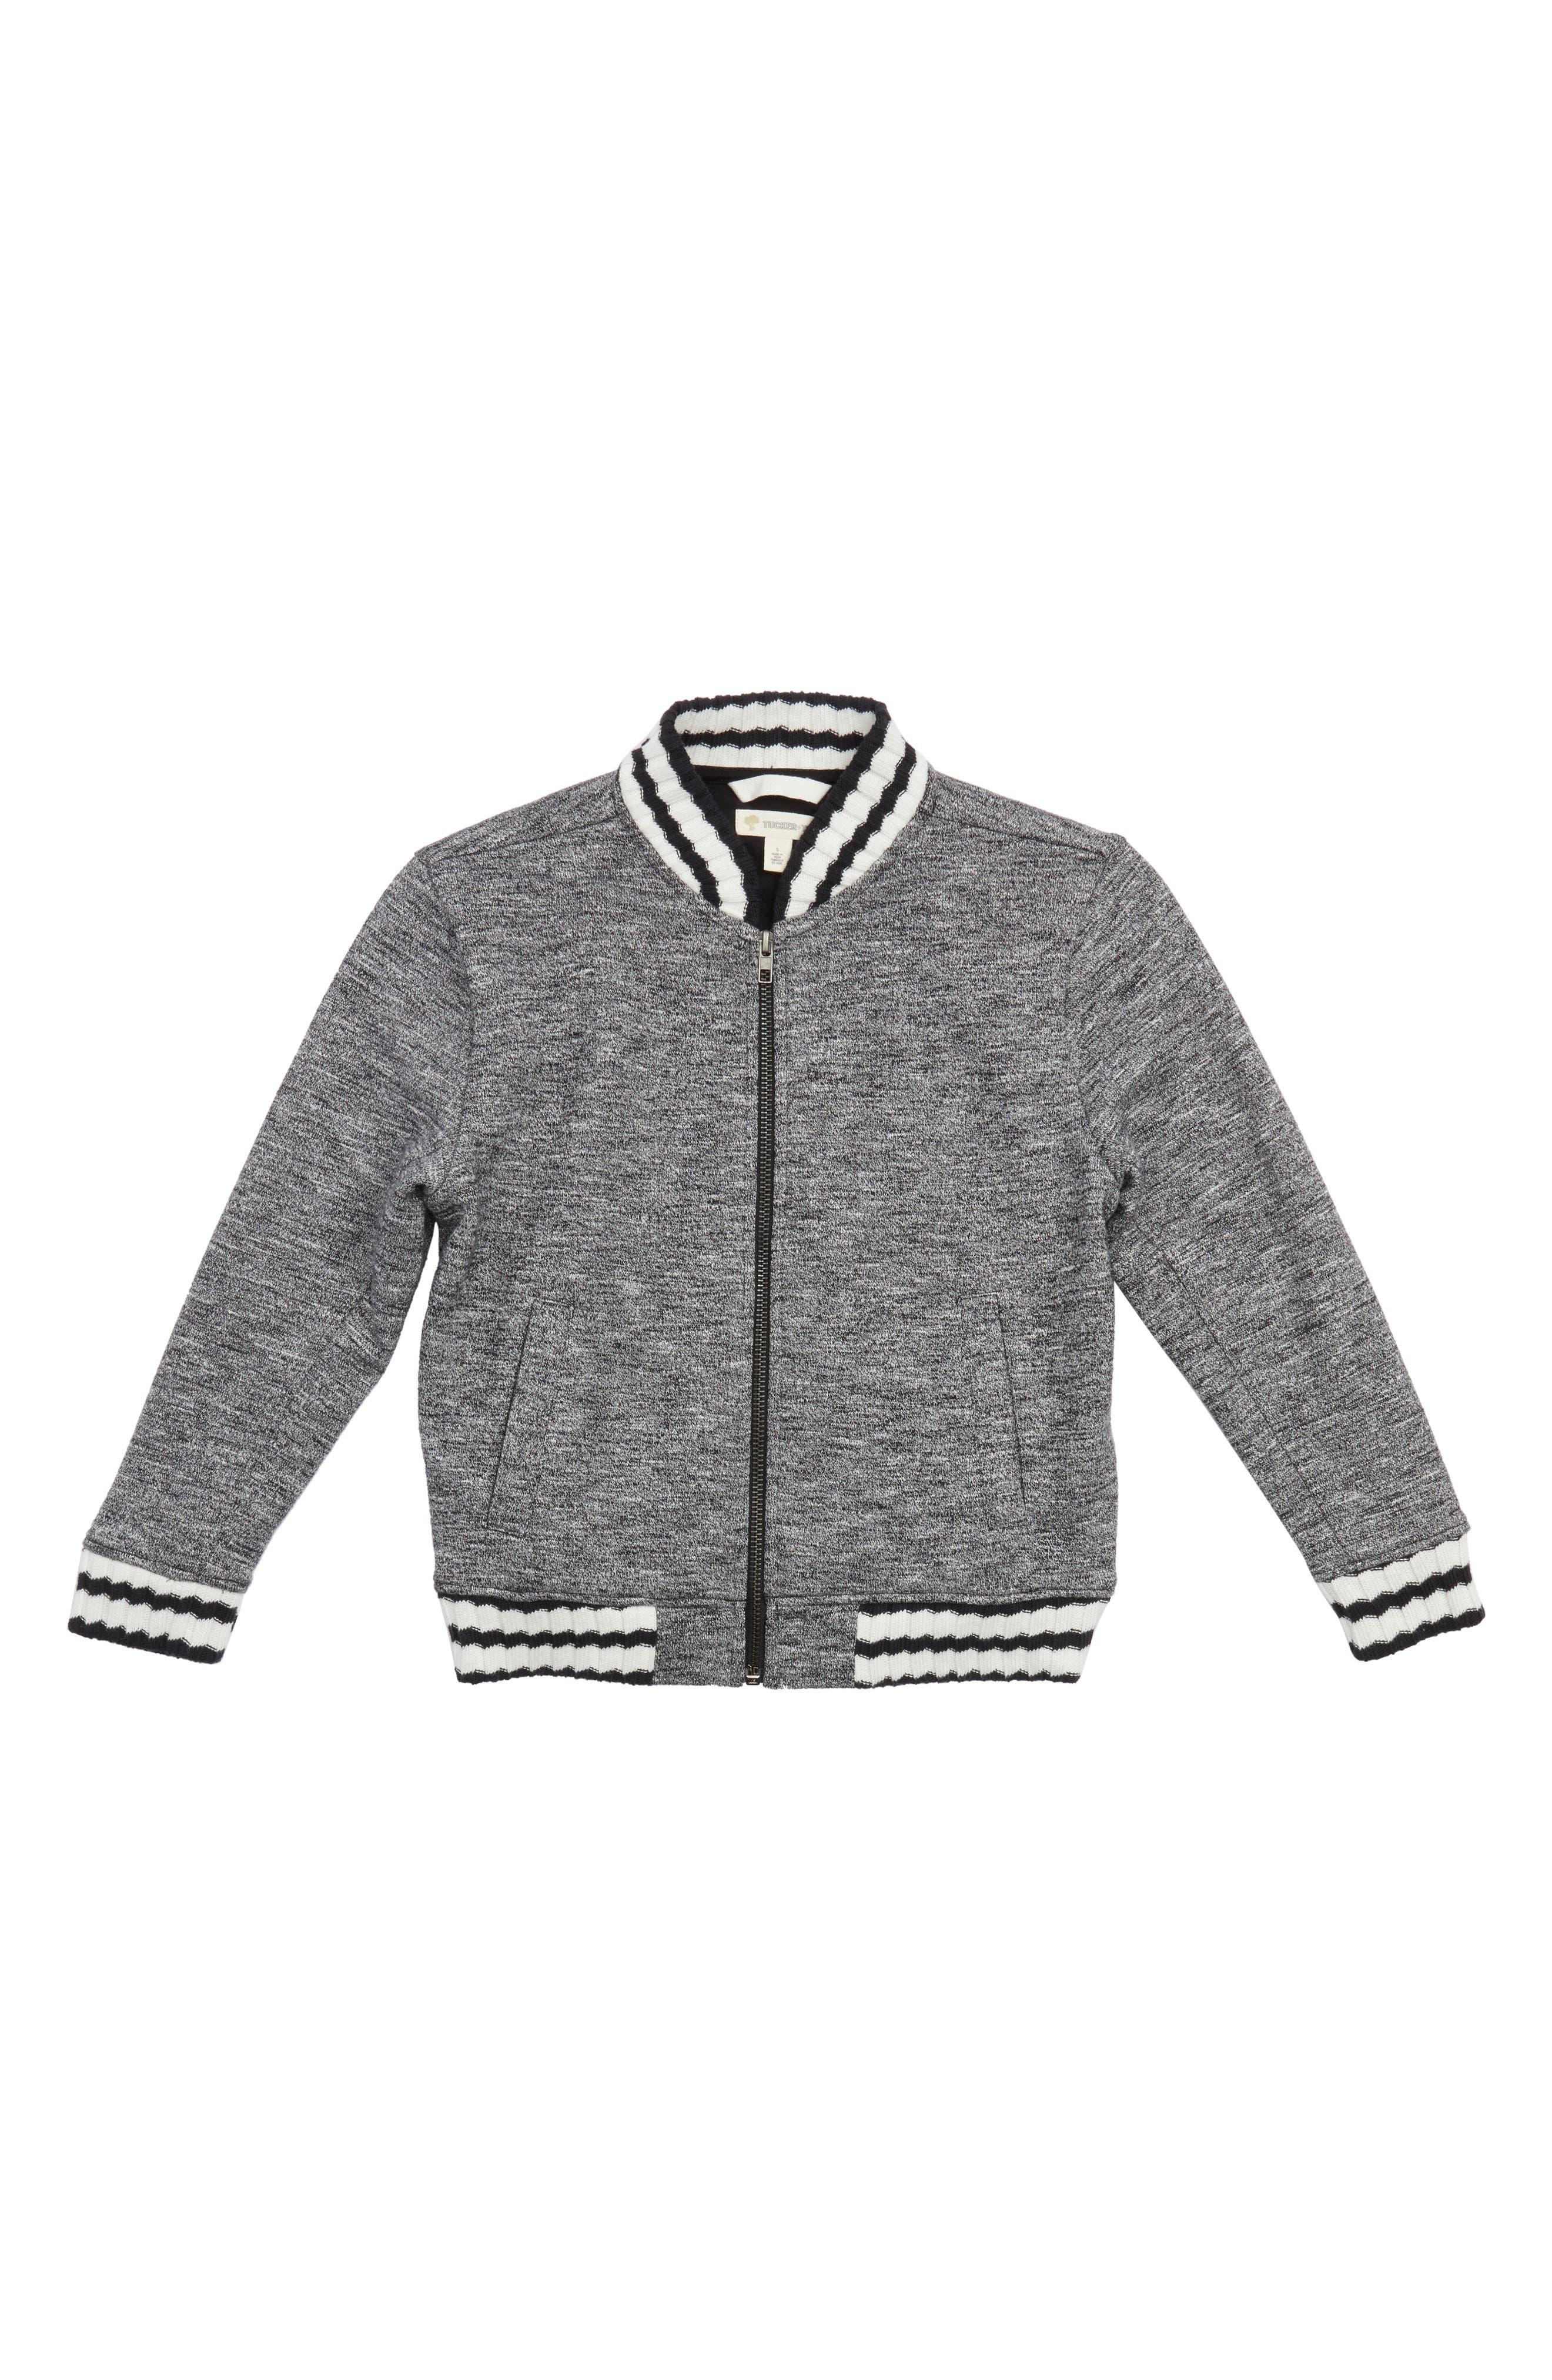 Mélange Varsity Jacket,                         Main,                         color, Black- White